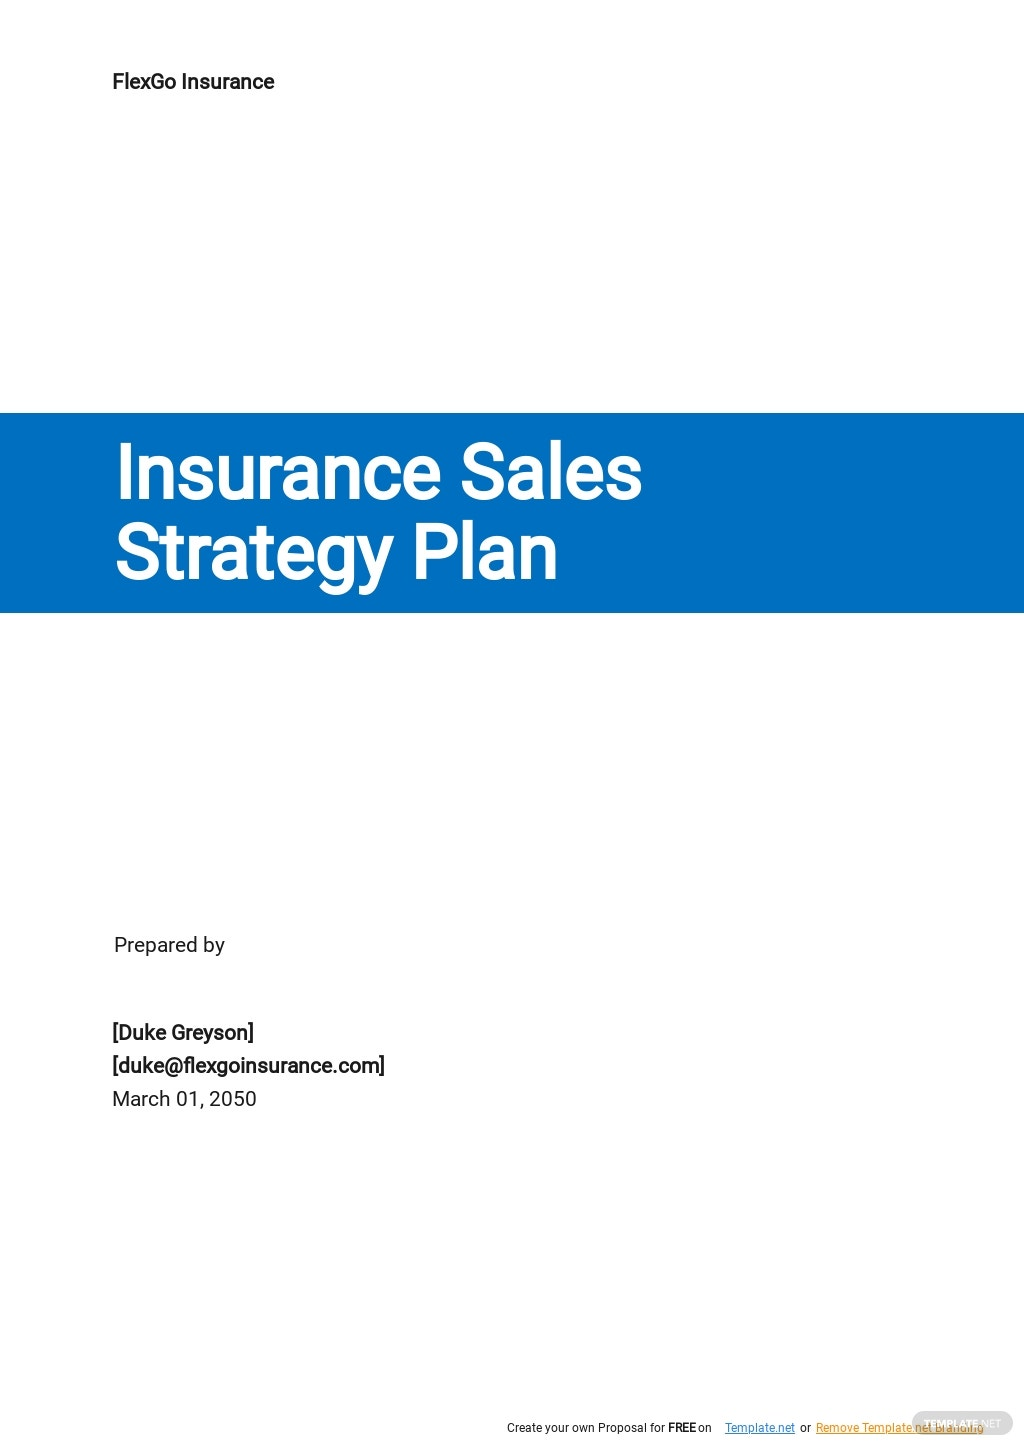 Insurance Sales Strategy Plan Template.jpe